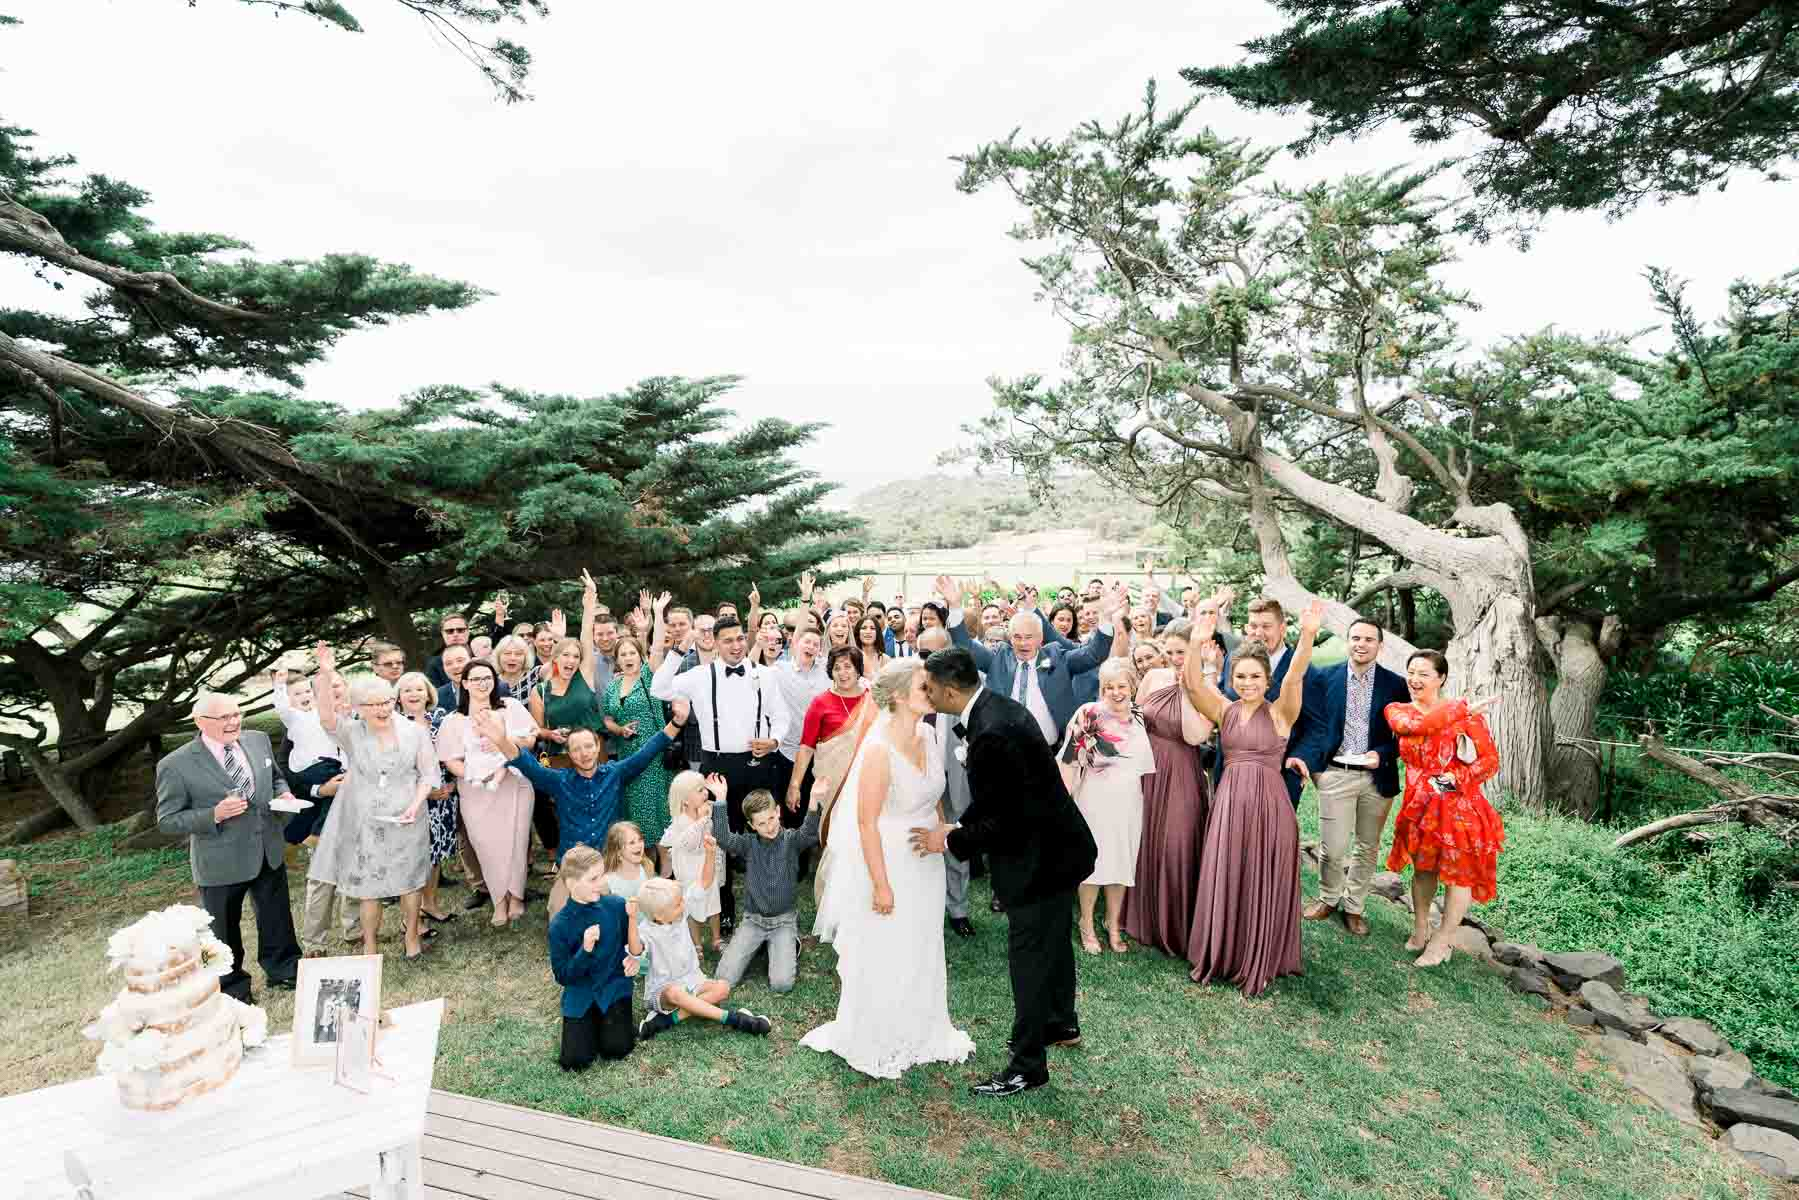 trenavin-chapel-phillip-island-wedding-heart+soul-weddings-sally-sean-00494.jpg